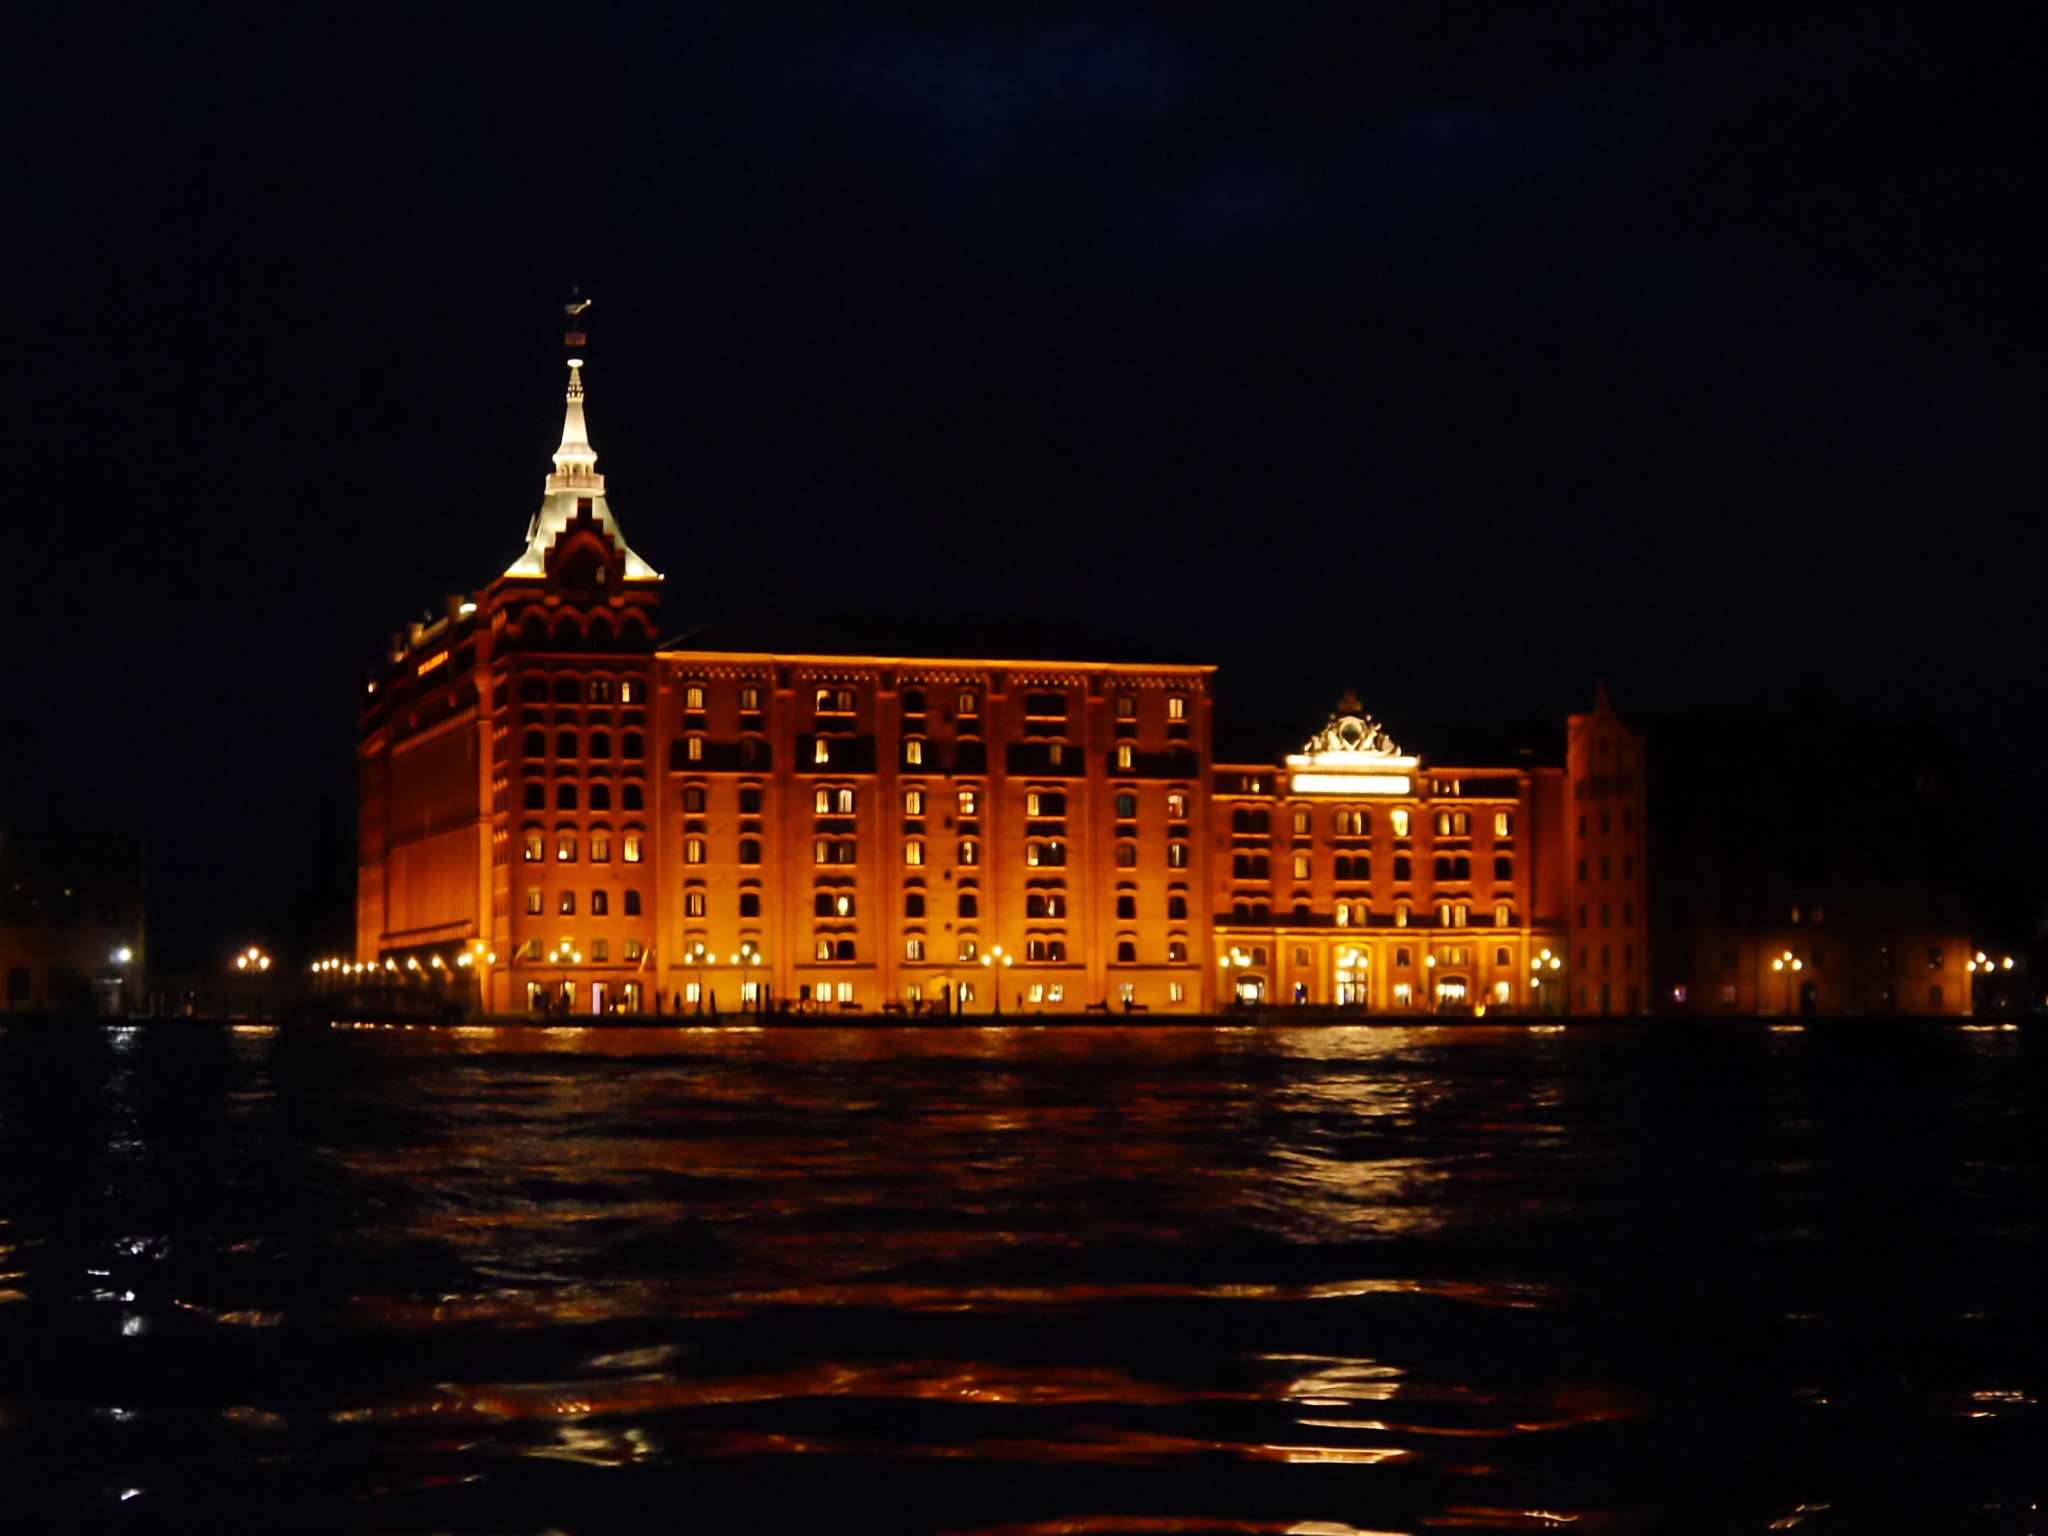 Hilton Molina Stucky Venice @ night by Mako7374